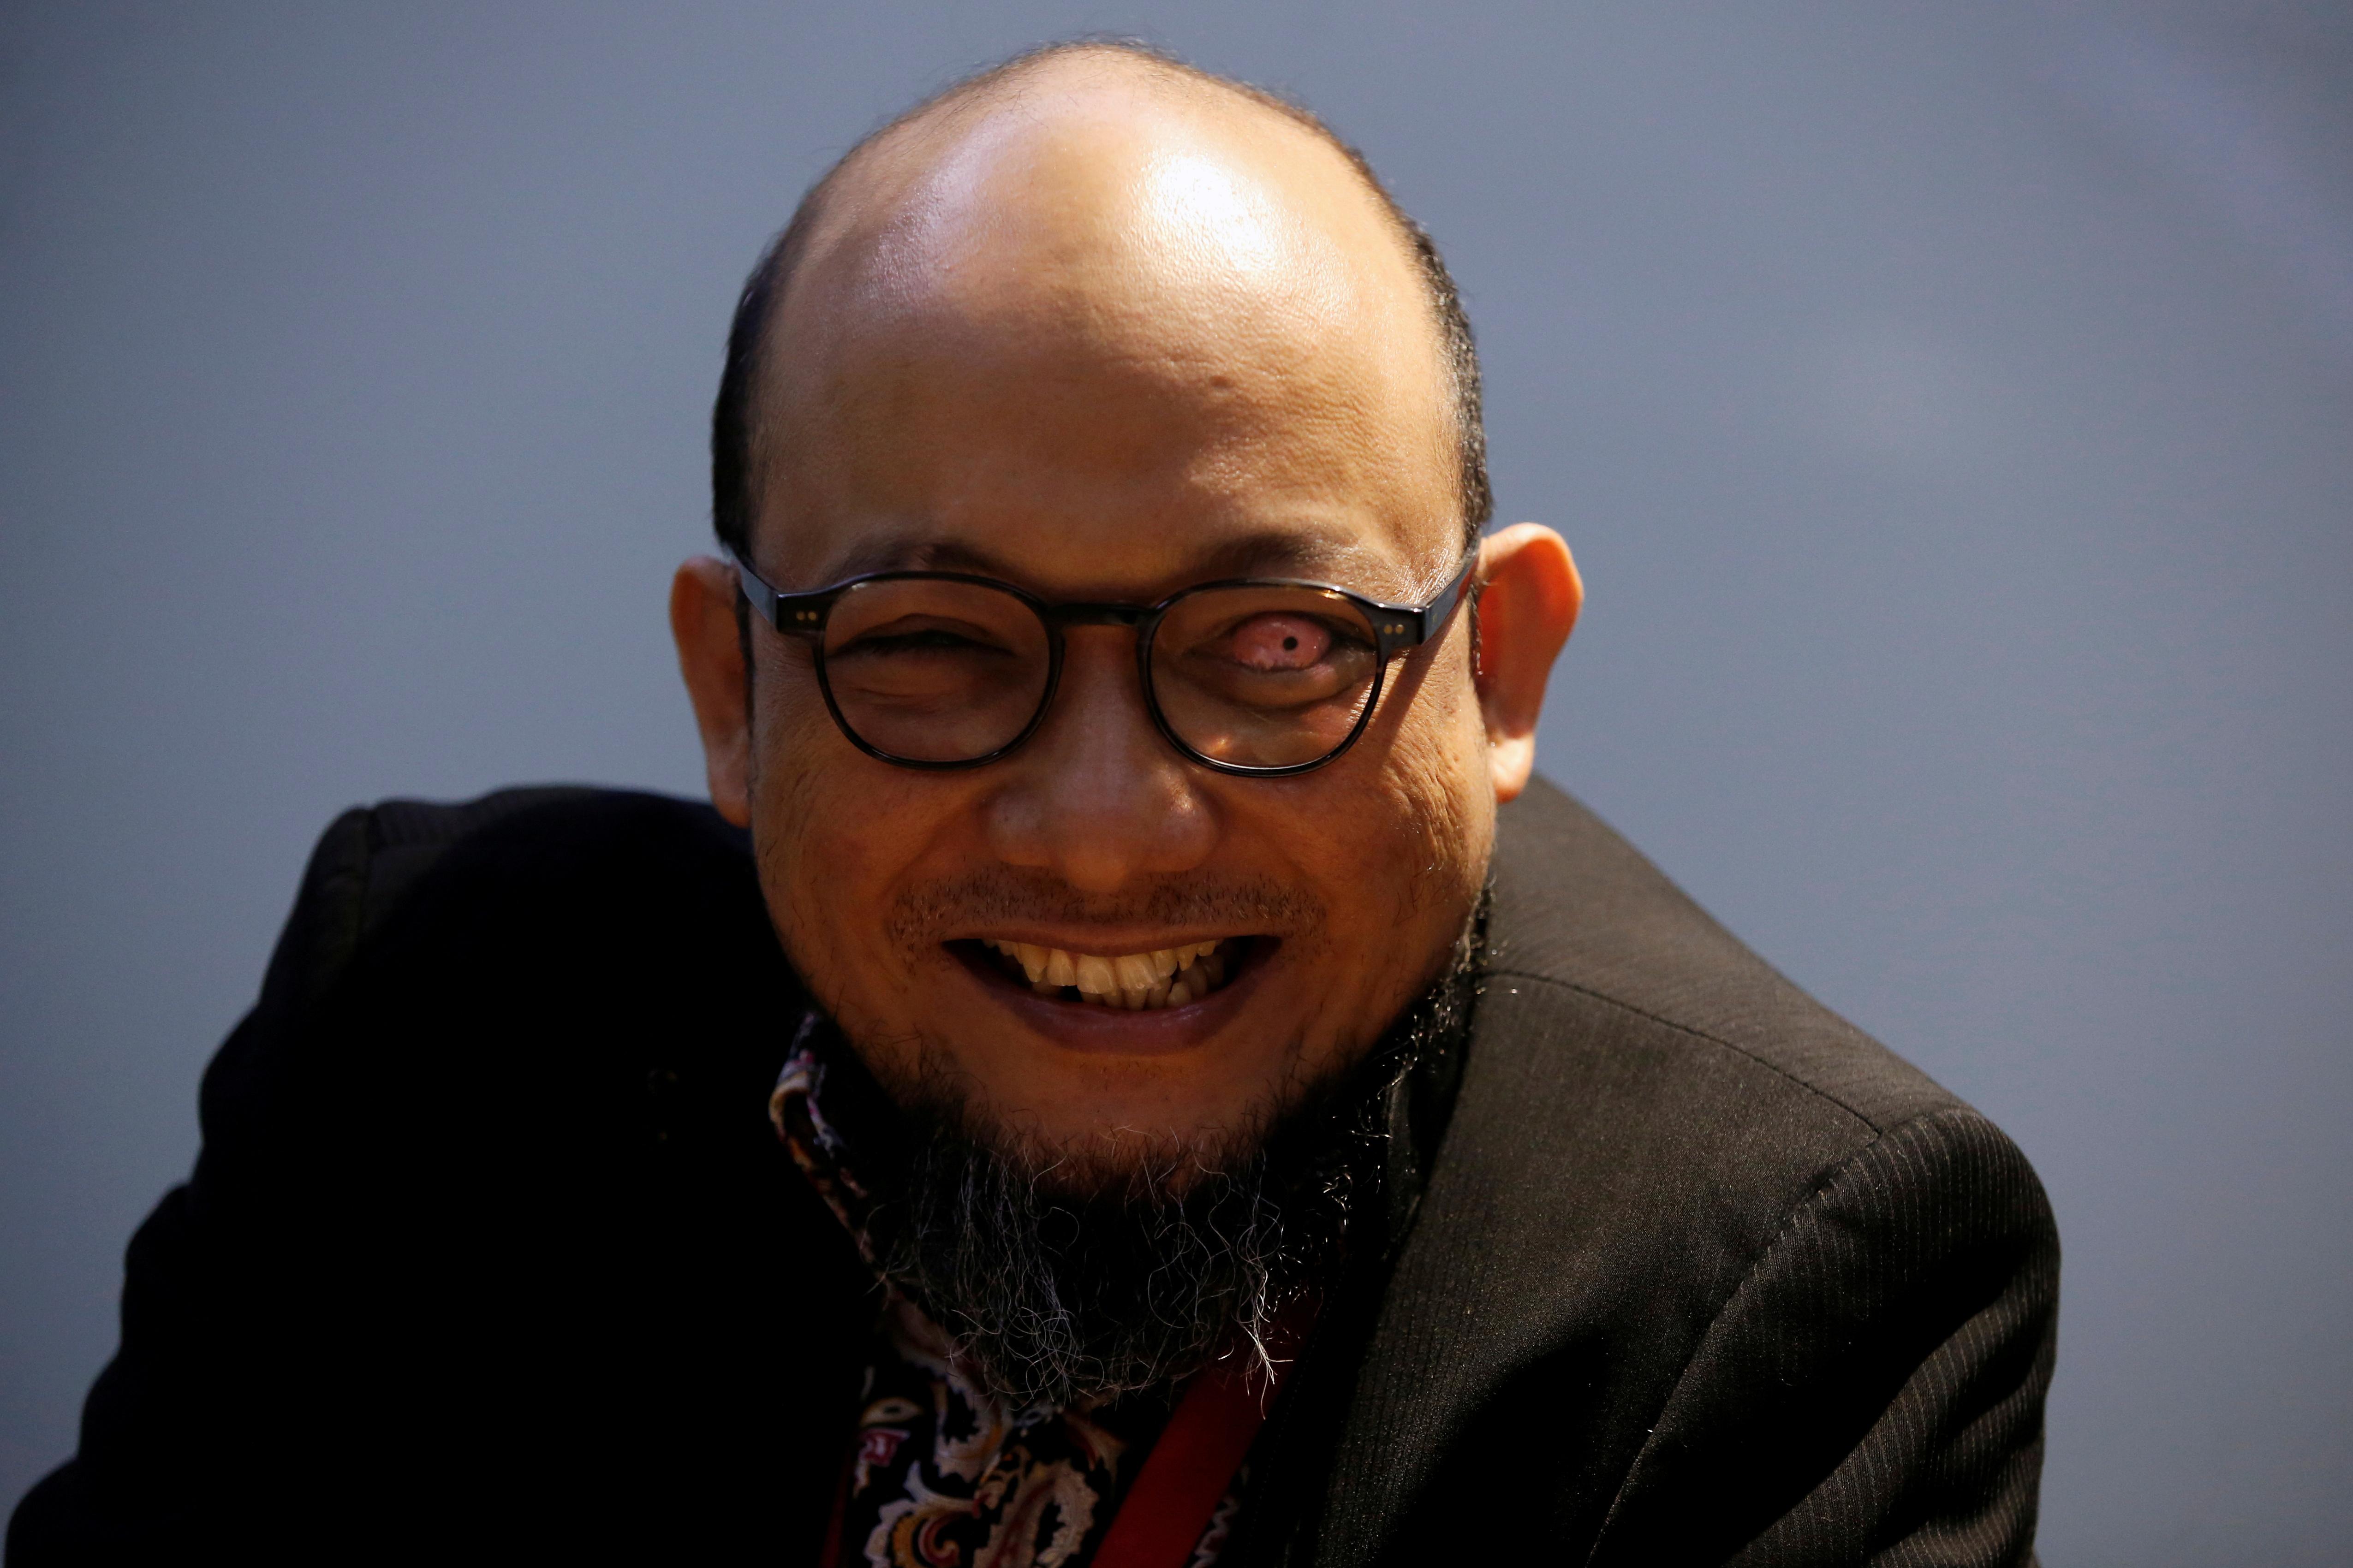 Novel Baswedan, penyidik senior KPK yang terkena air asam di wajahnya pada tahun 2017, tersenyum saat diwawancarai di markas Komisi Pemberantasan Korupsi KPK di Jakarta, Indonesia, 6 Desember 2019 REUTERS/Willy Kurniawan